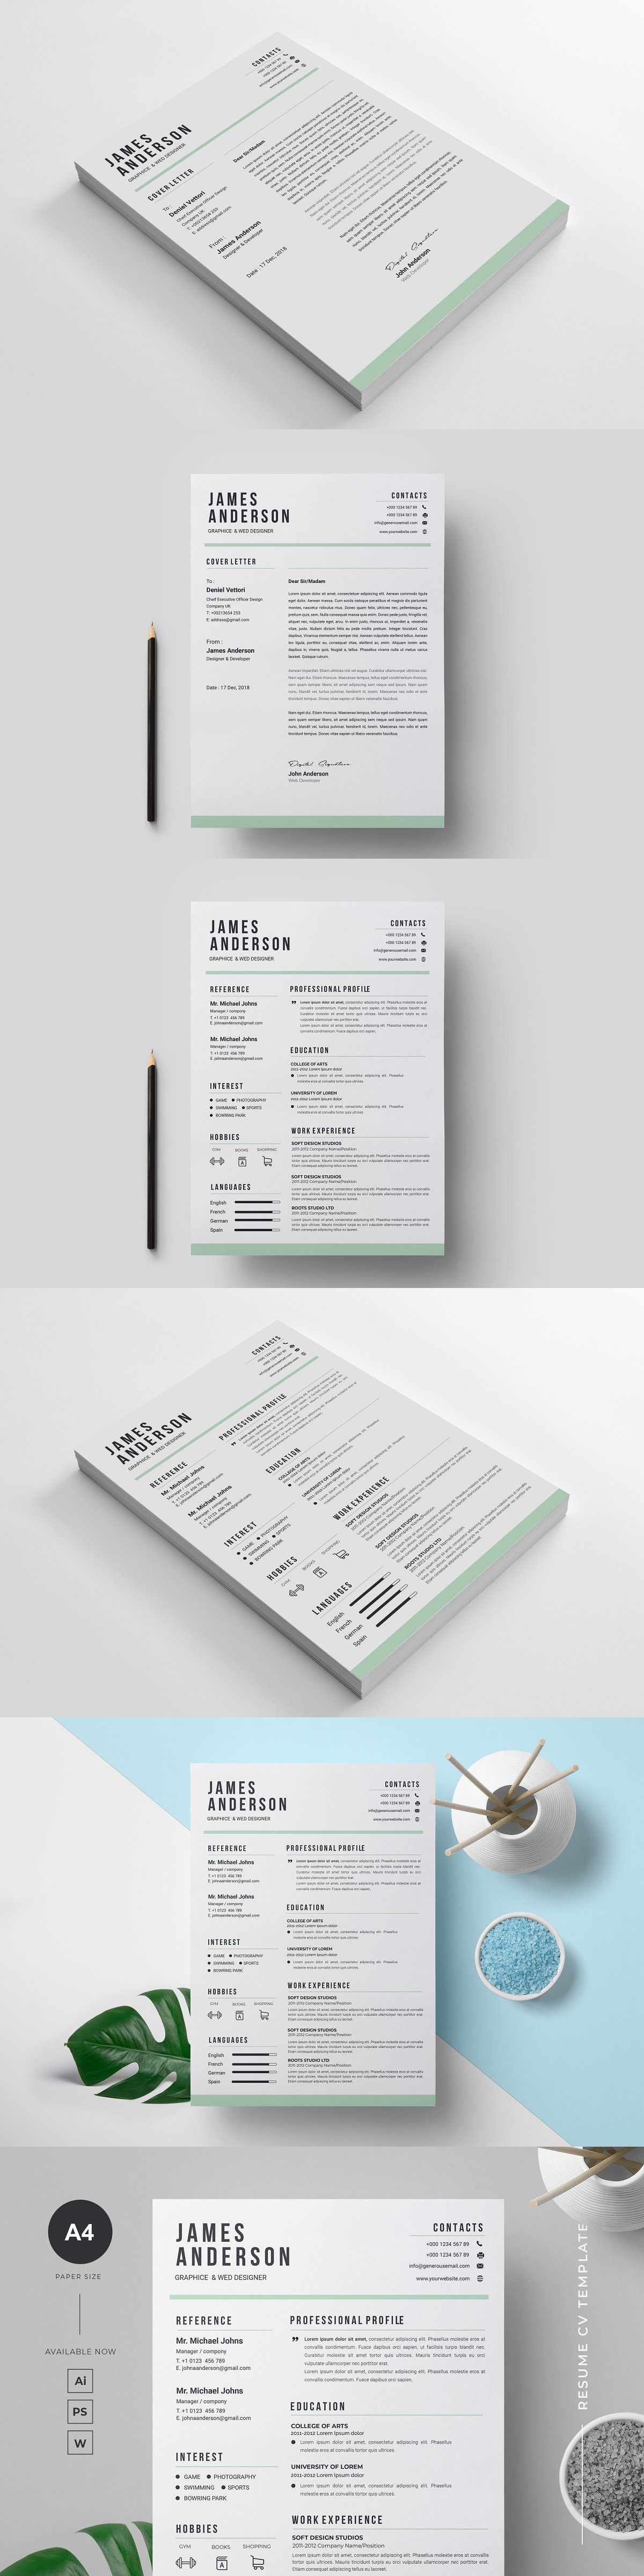 Resume Simple resume template, Resume, Simple resume